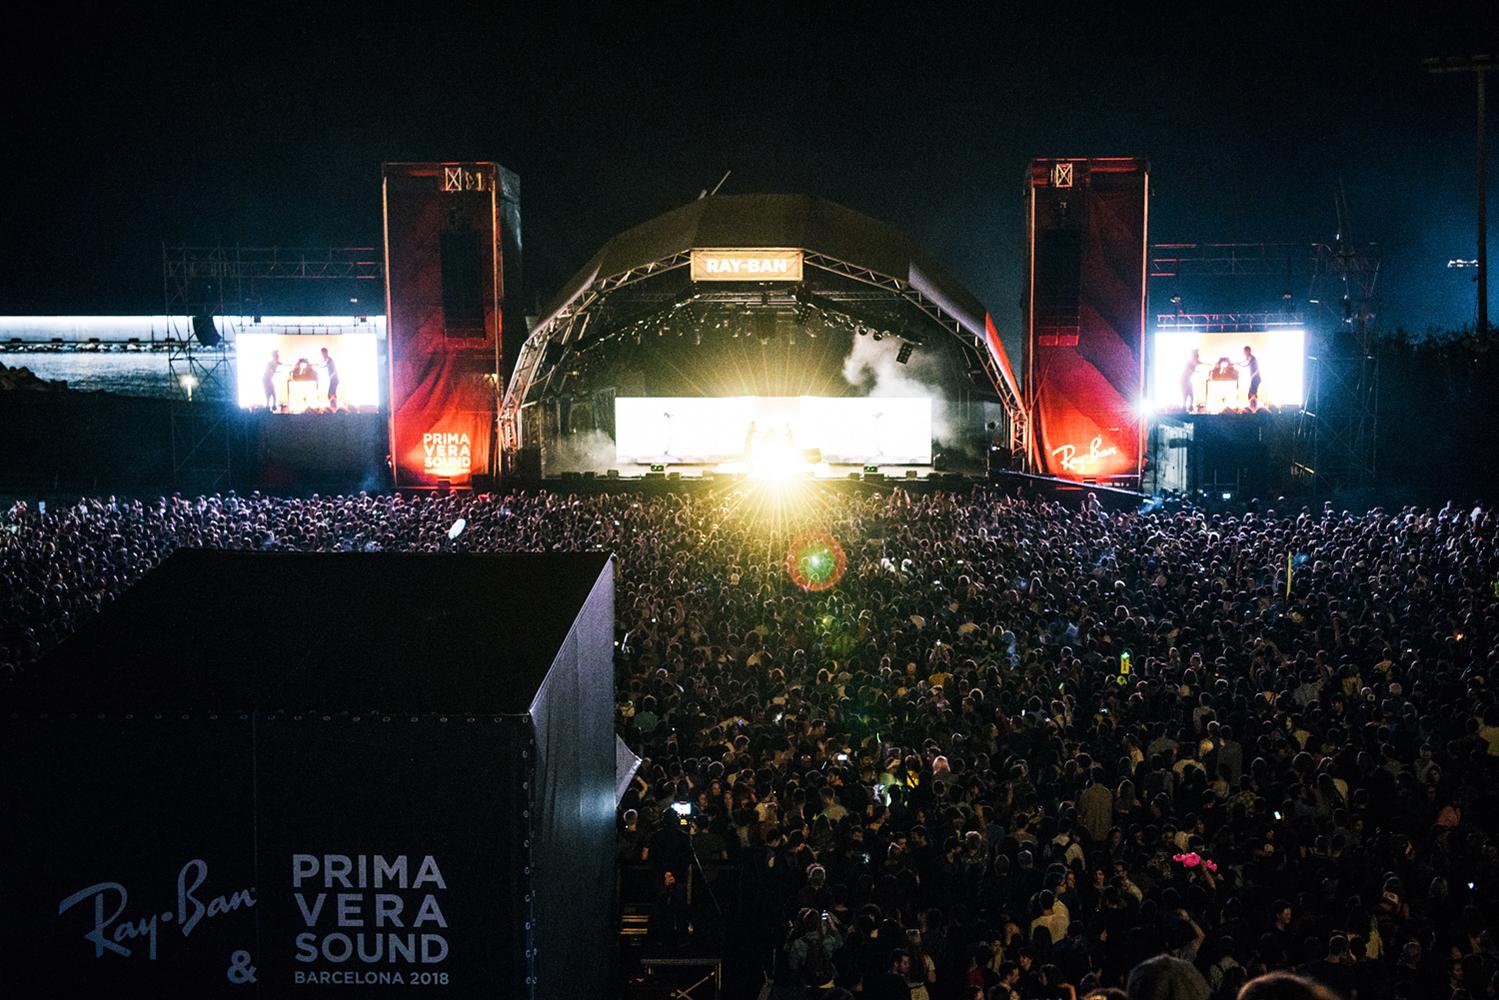 Primavera sound Barcelona 2018 - Gaelle Beri-624.jpg